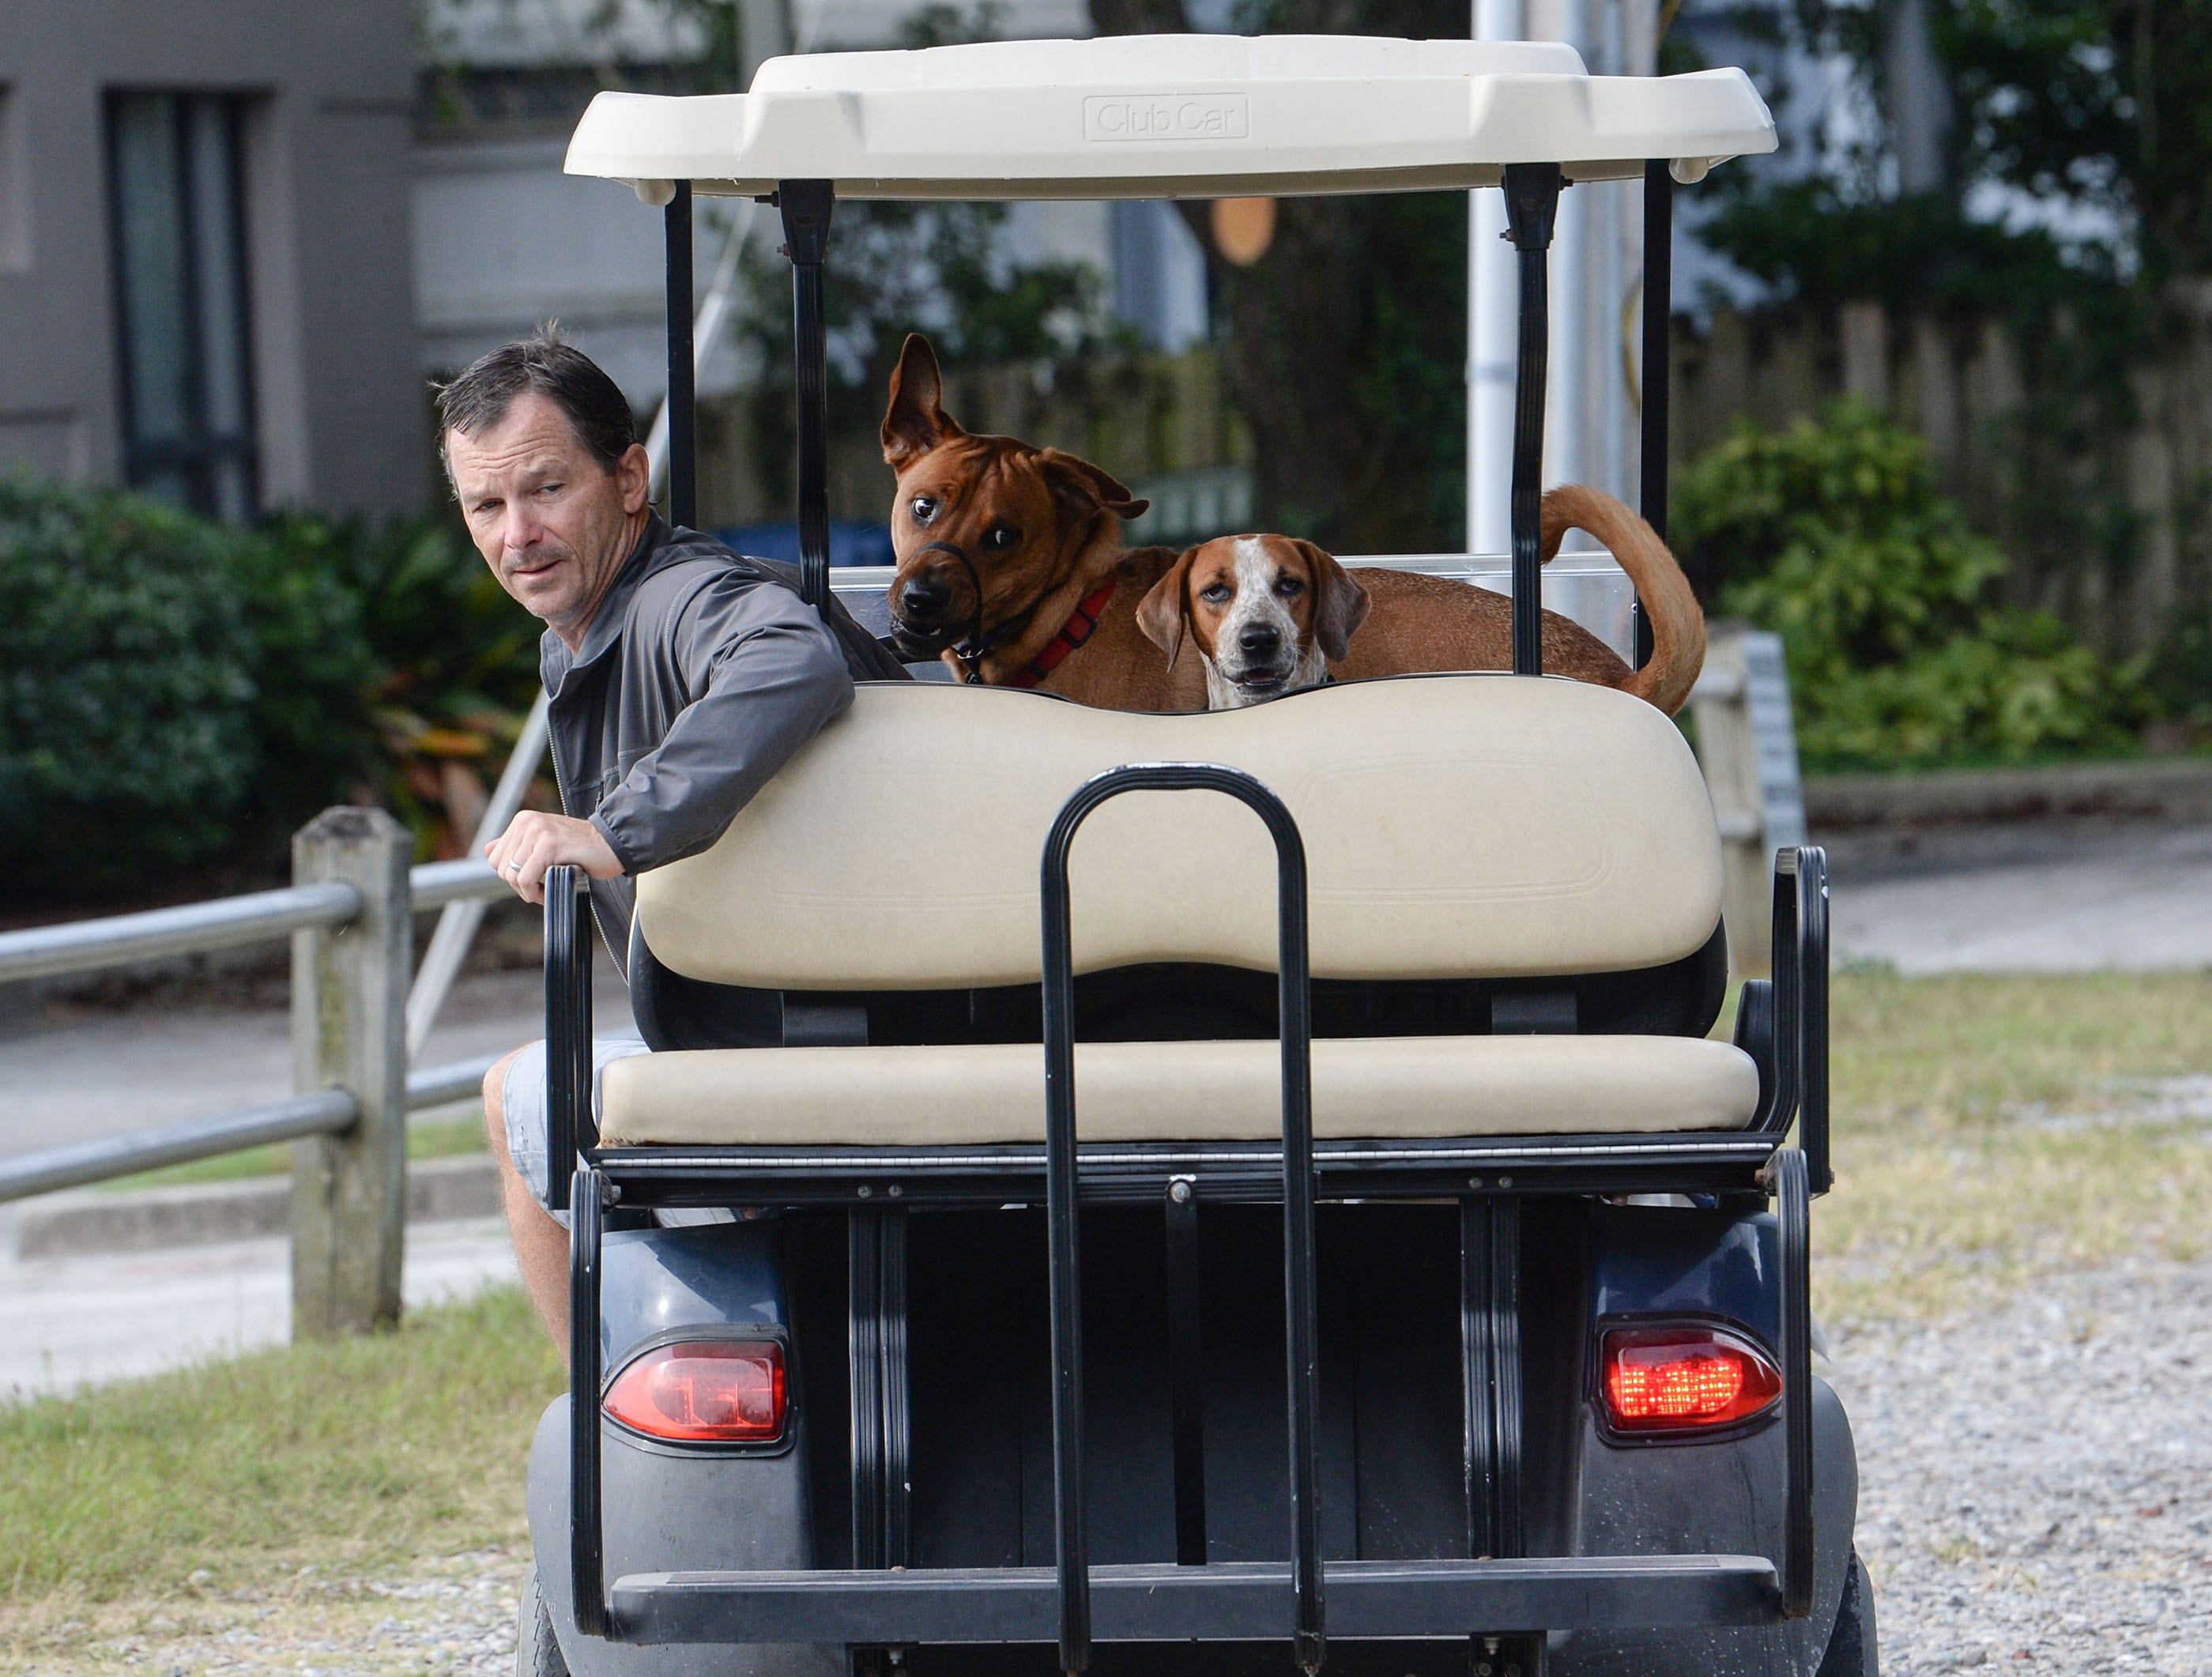 Mark Johnson of Wilmington drives his three dogs by the Crocker's Landing harbor in Wilmington, before Hurricane Florence arrives on Thursday, September 13, 2018. (Ken Ruinard / Greenville News / Gannett USA Today Network / 2018 )